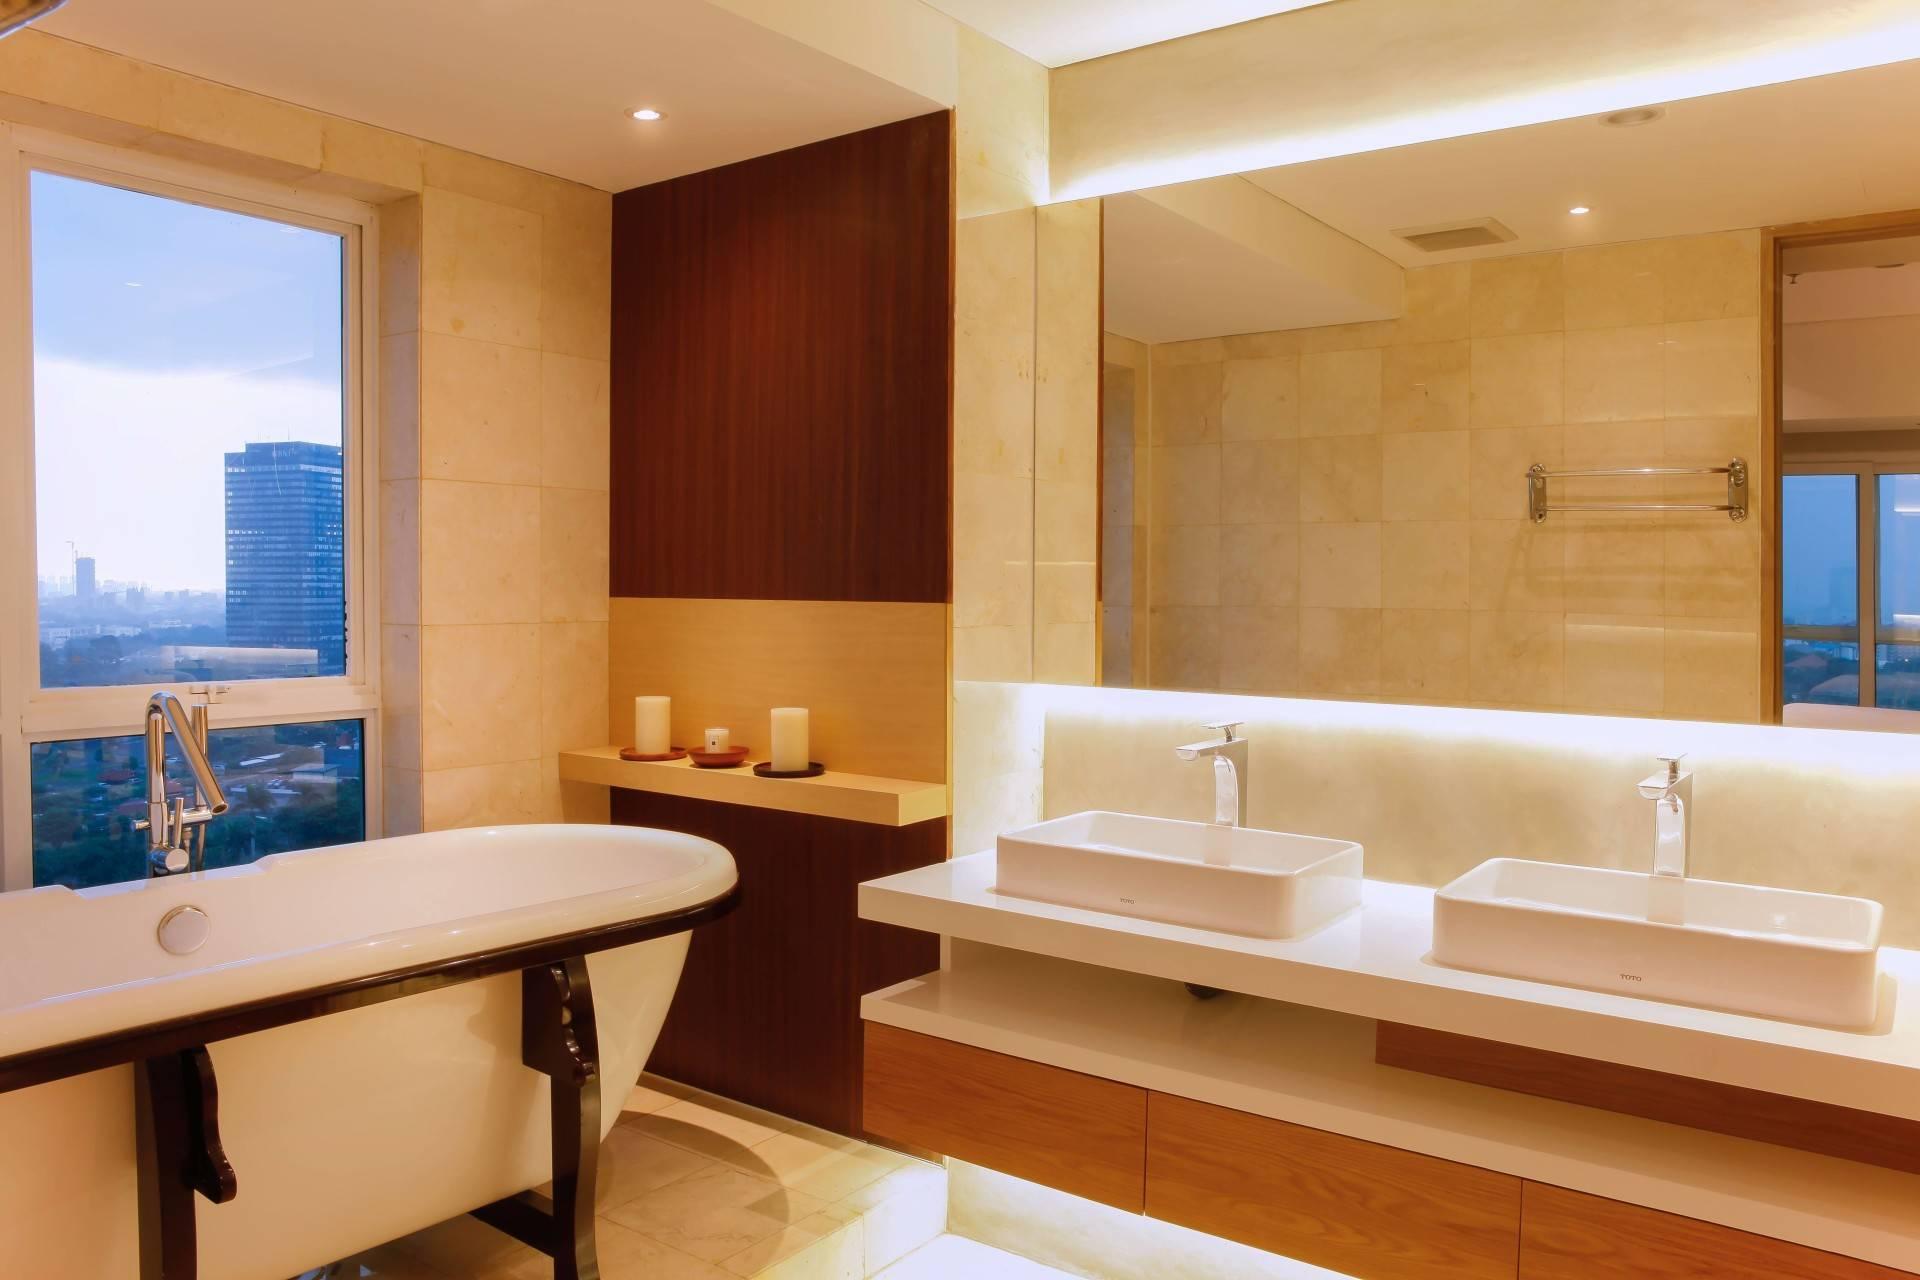 Design Intervention Pavilion Apartment At Kh Mas Mansyur Jakarta Jakarta Bathroom Minimalis,modern,industrial,glass  2591